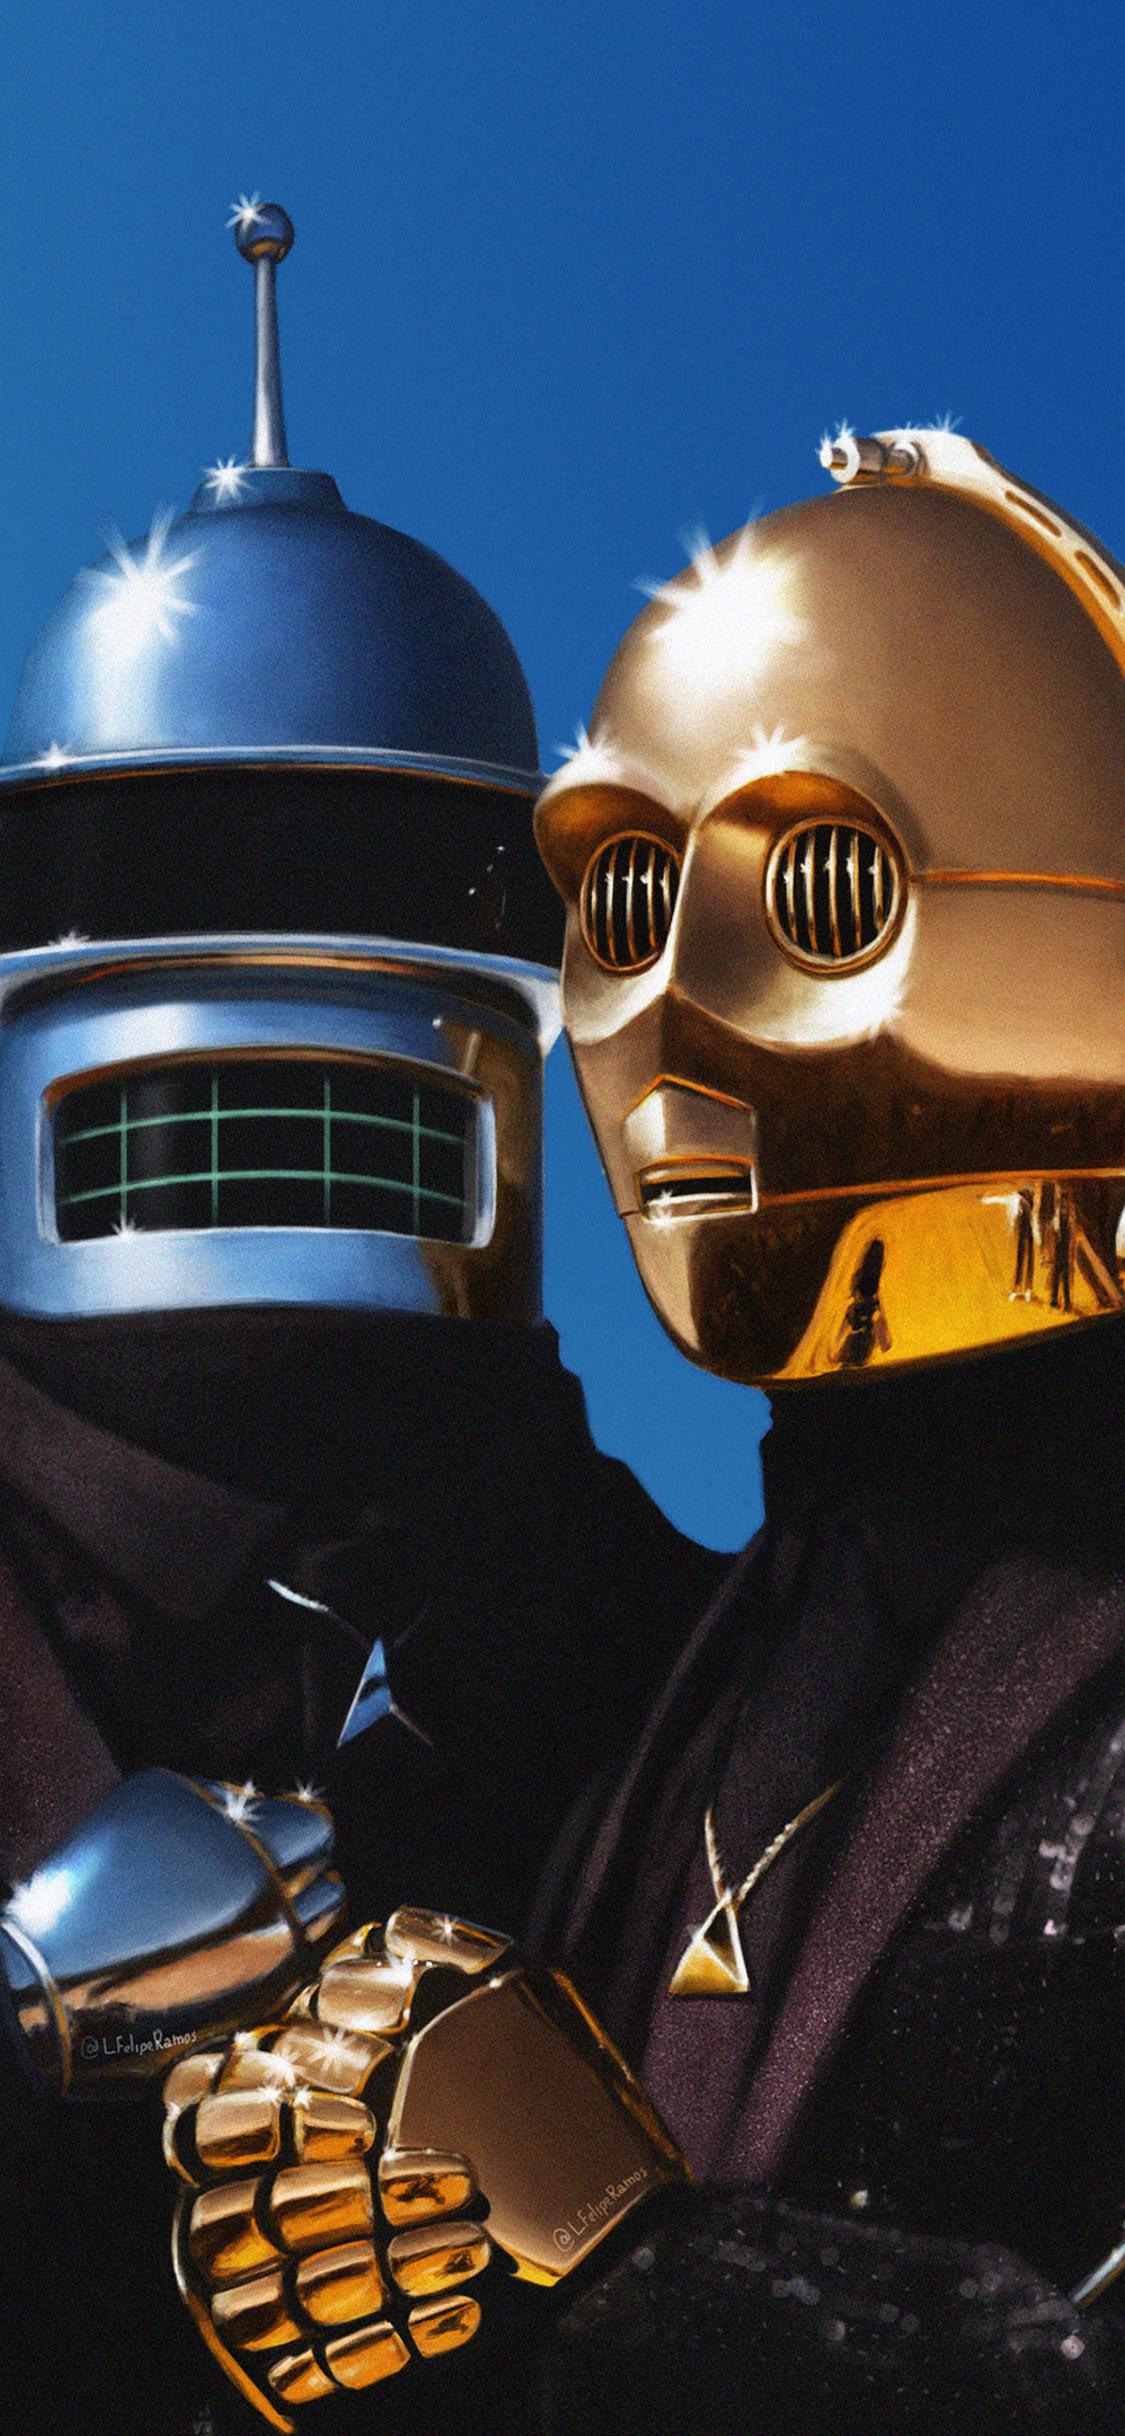 1125x2436 Daft Punk And C3PO Iphone XS,Iphone 10,Iphone X ...